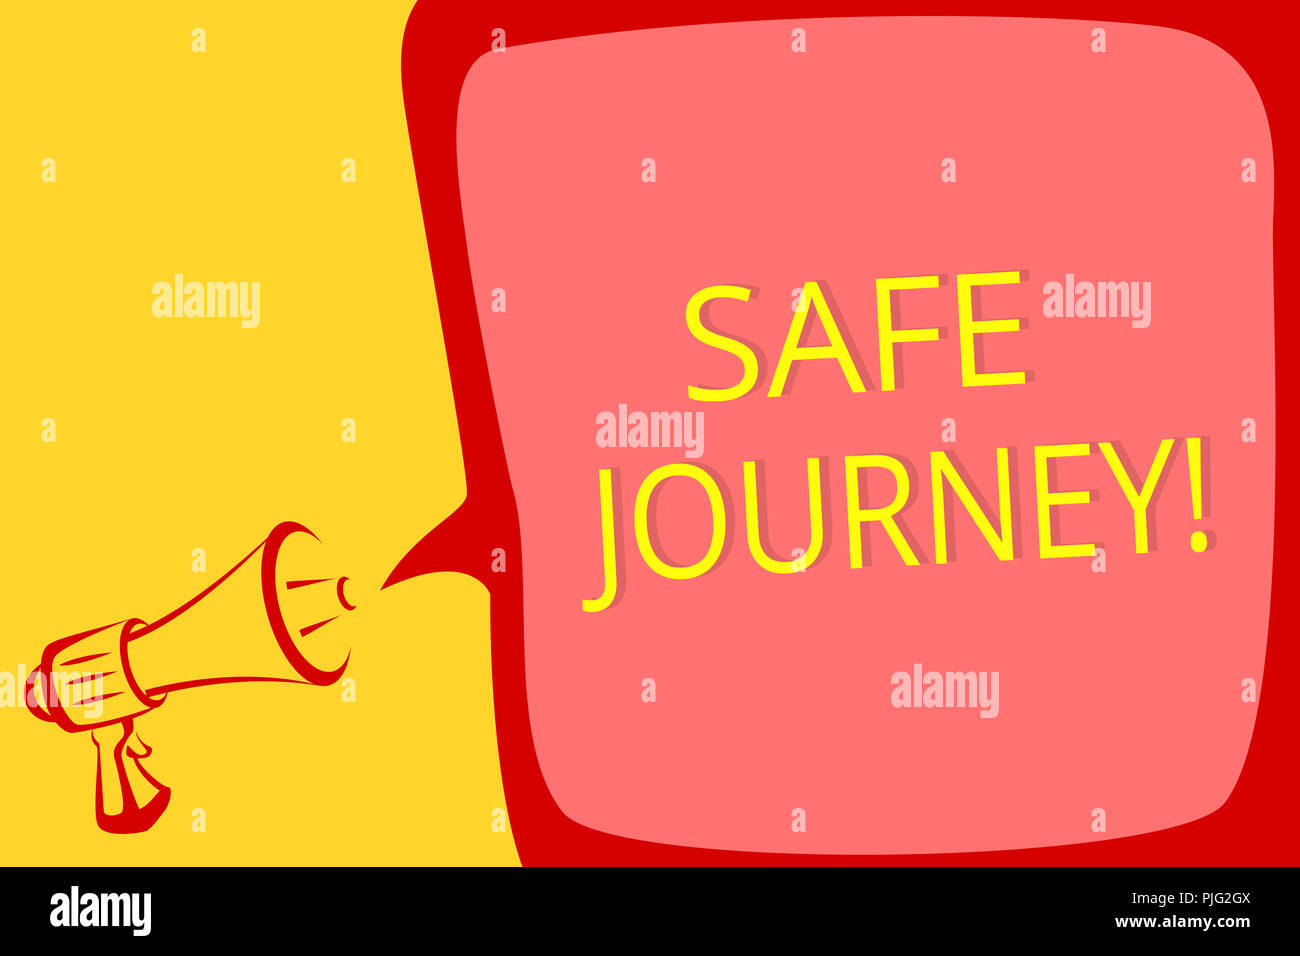 Writing Note Showing Safe Journey Business Photo Showcasing Blessing Bid Farewell Drive Carefully Use Seatbelt Strap Megaphone Loudspeaker Speech Bub Stock Photo Alamy